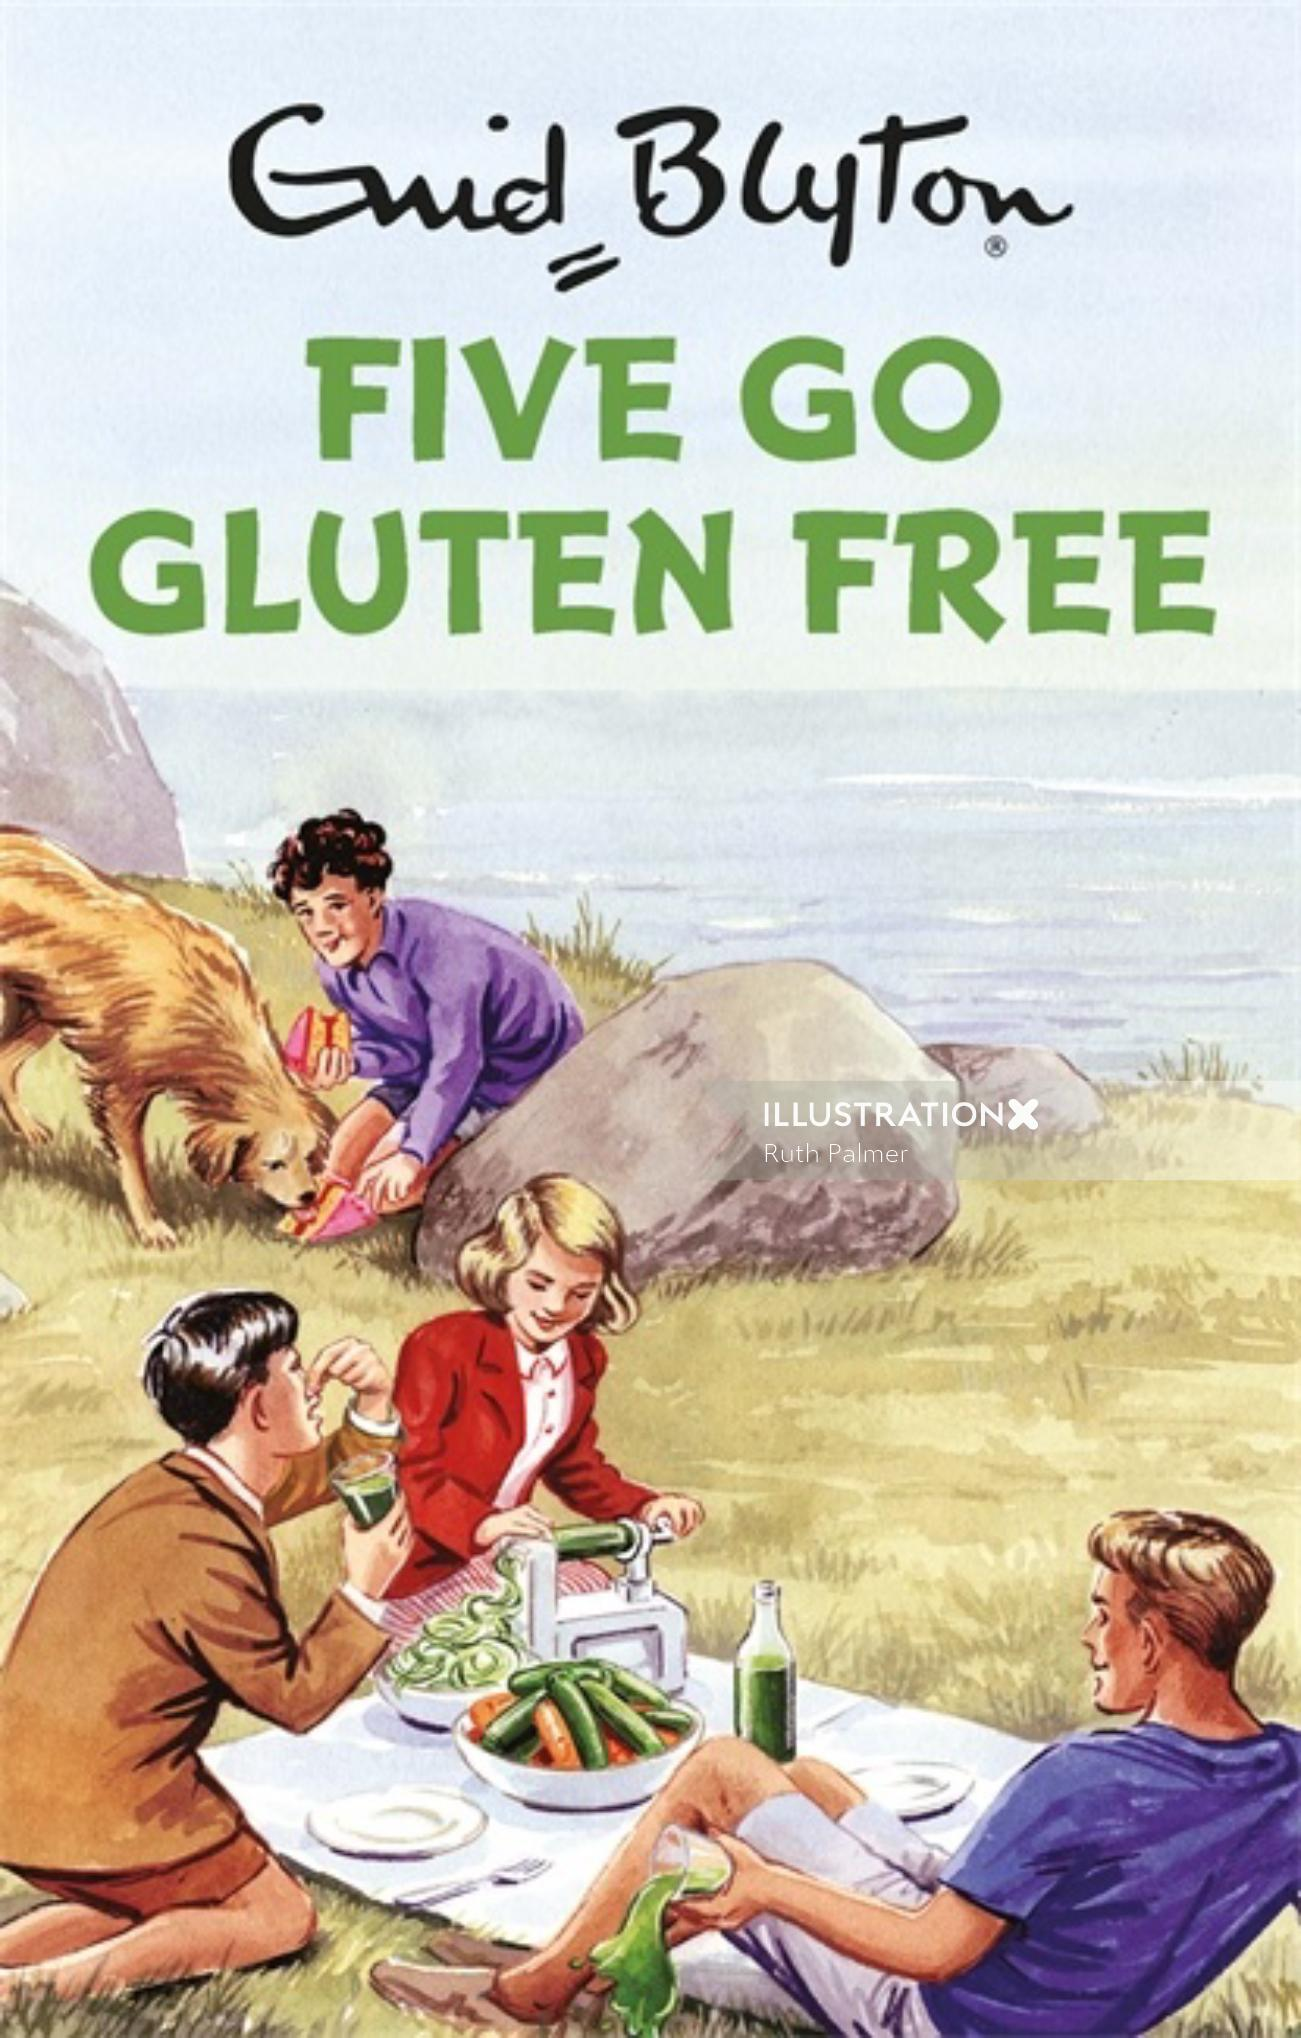 Book cover illustration of five go gluten free